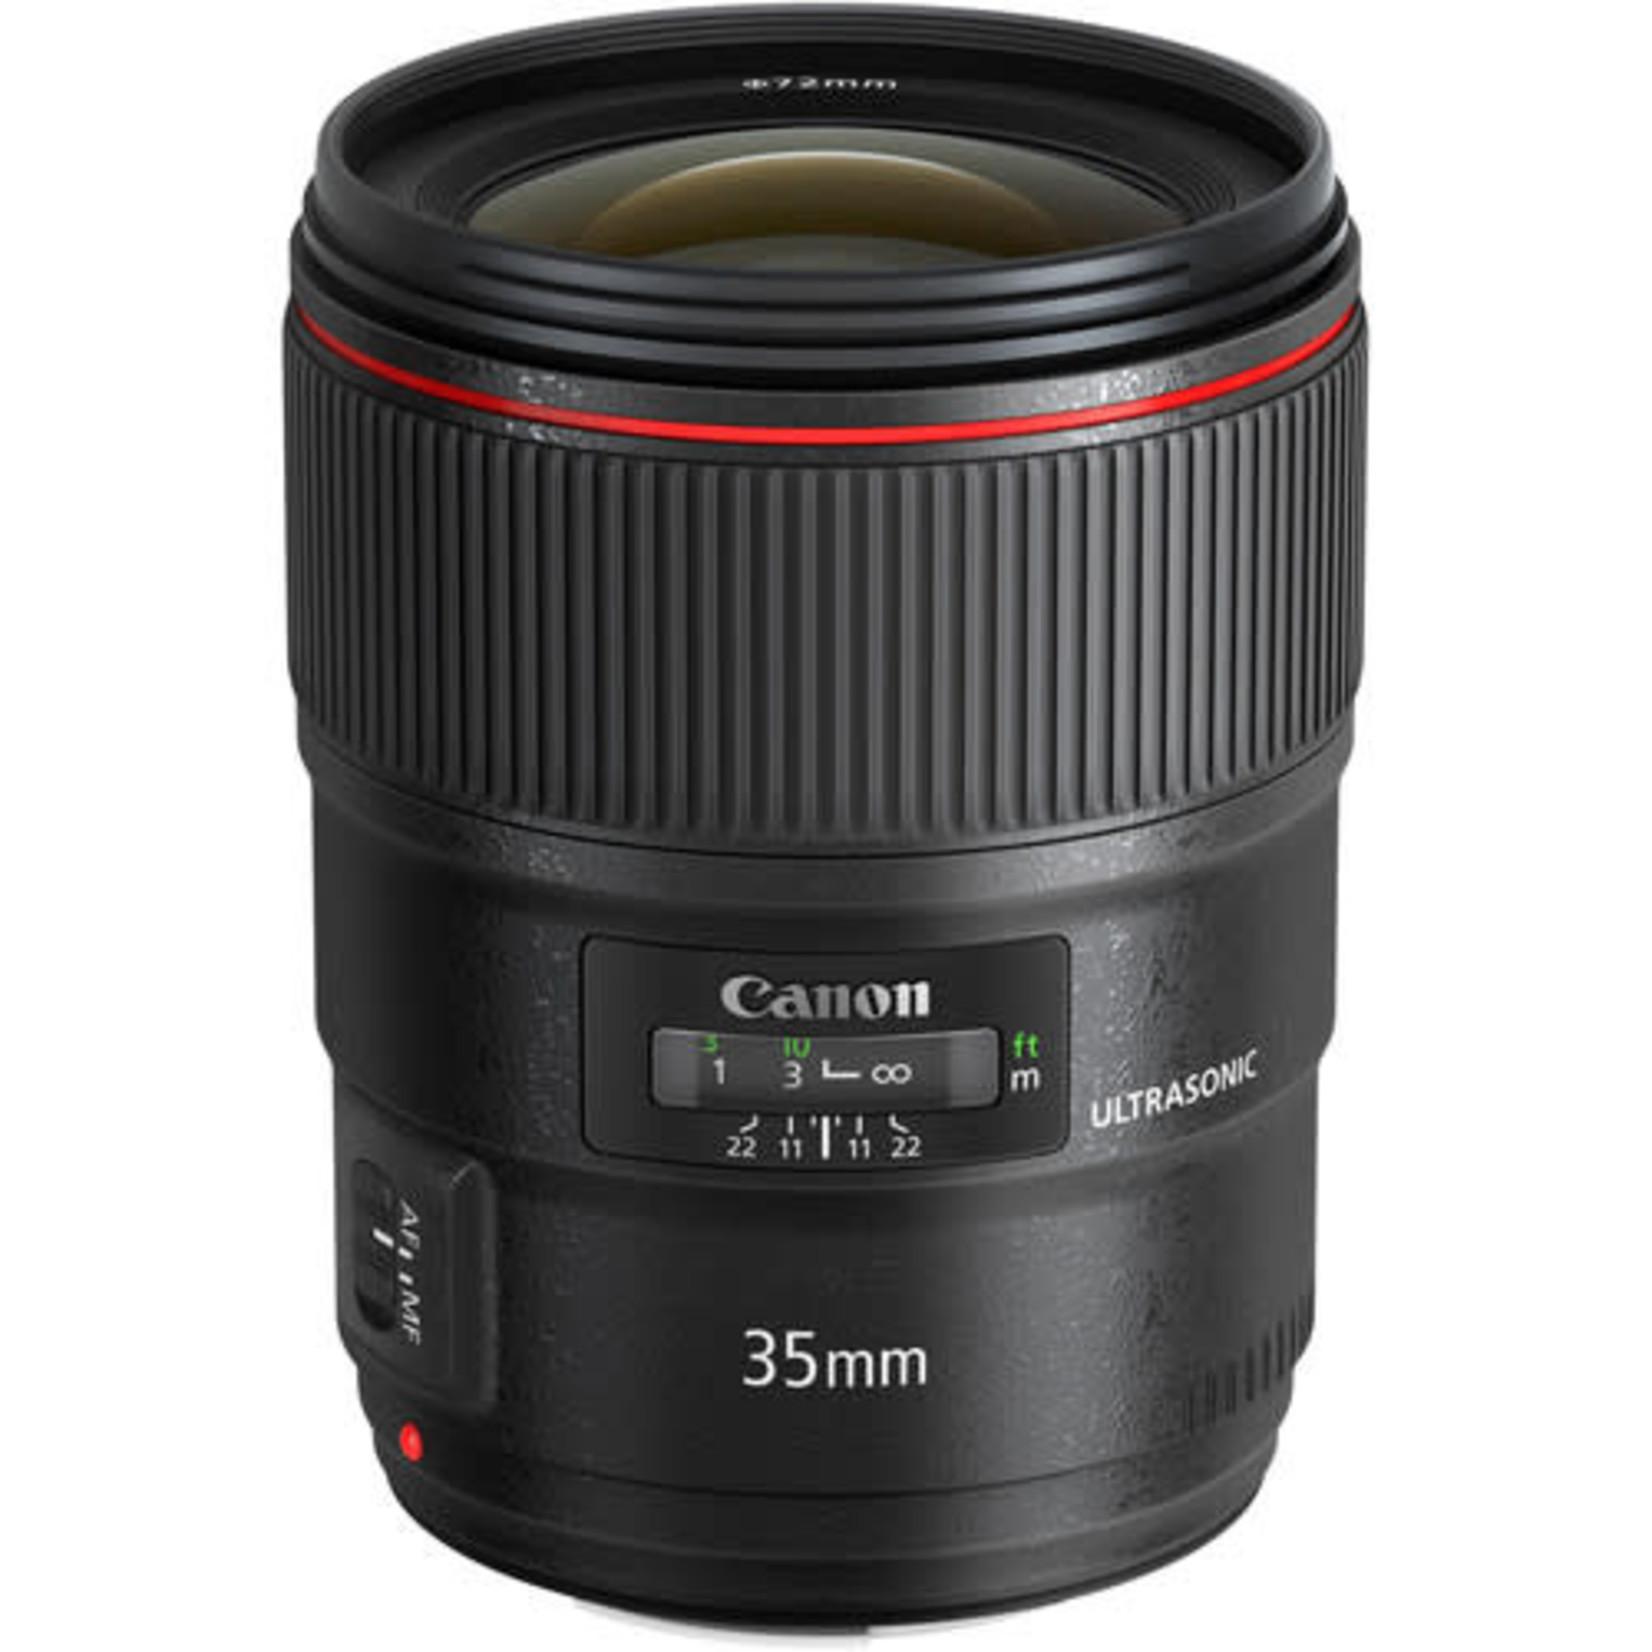 Canon Canon EF 35mm f/1.4L II USM Lens